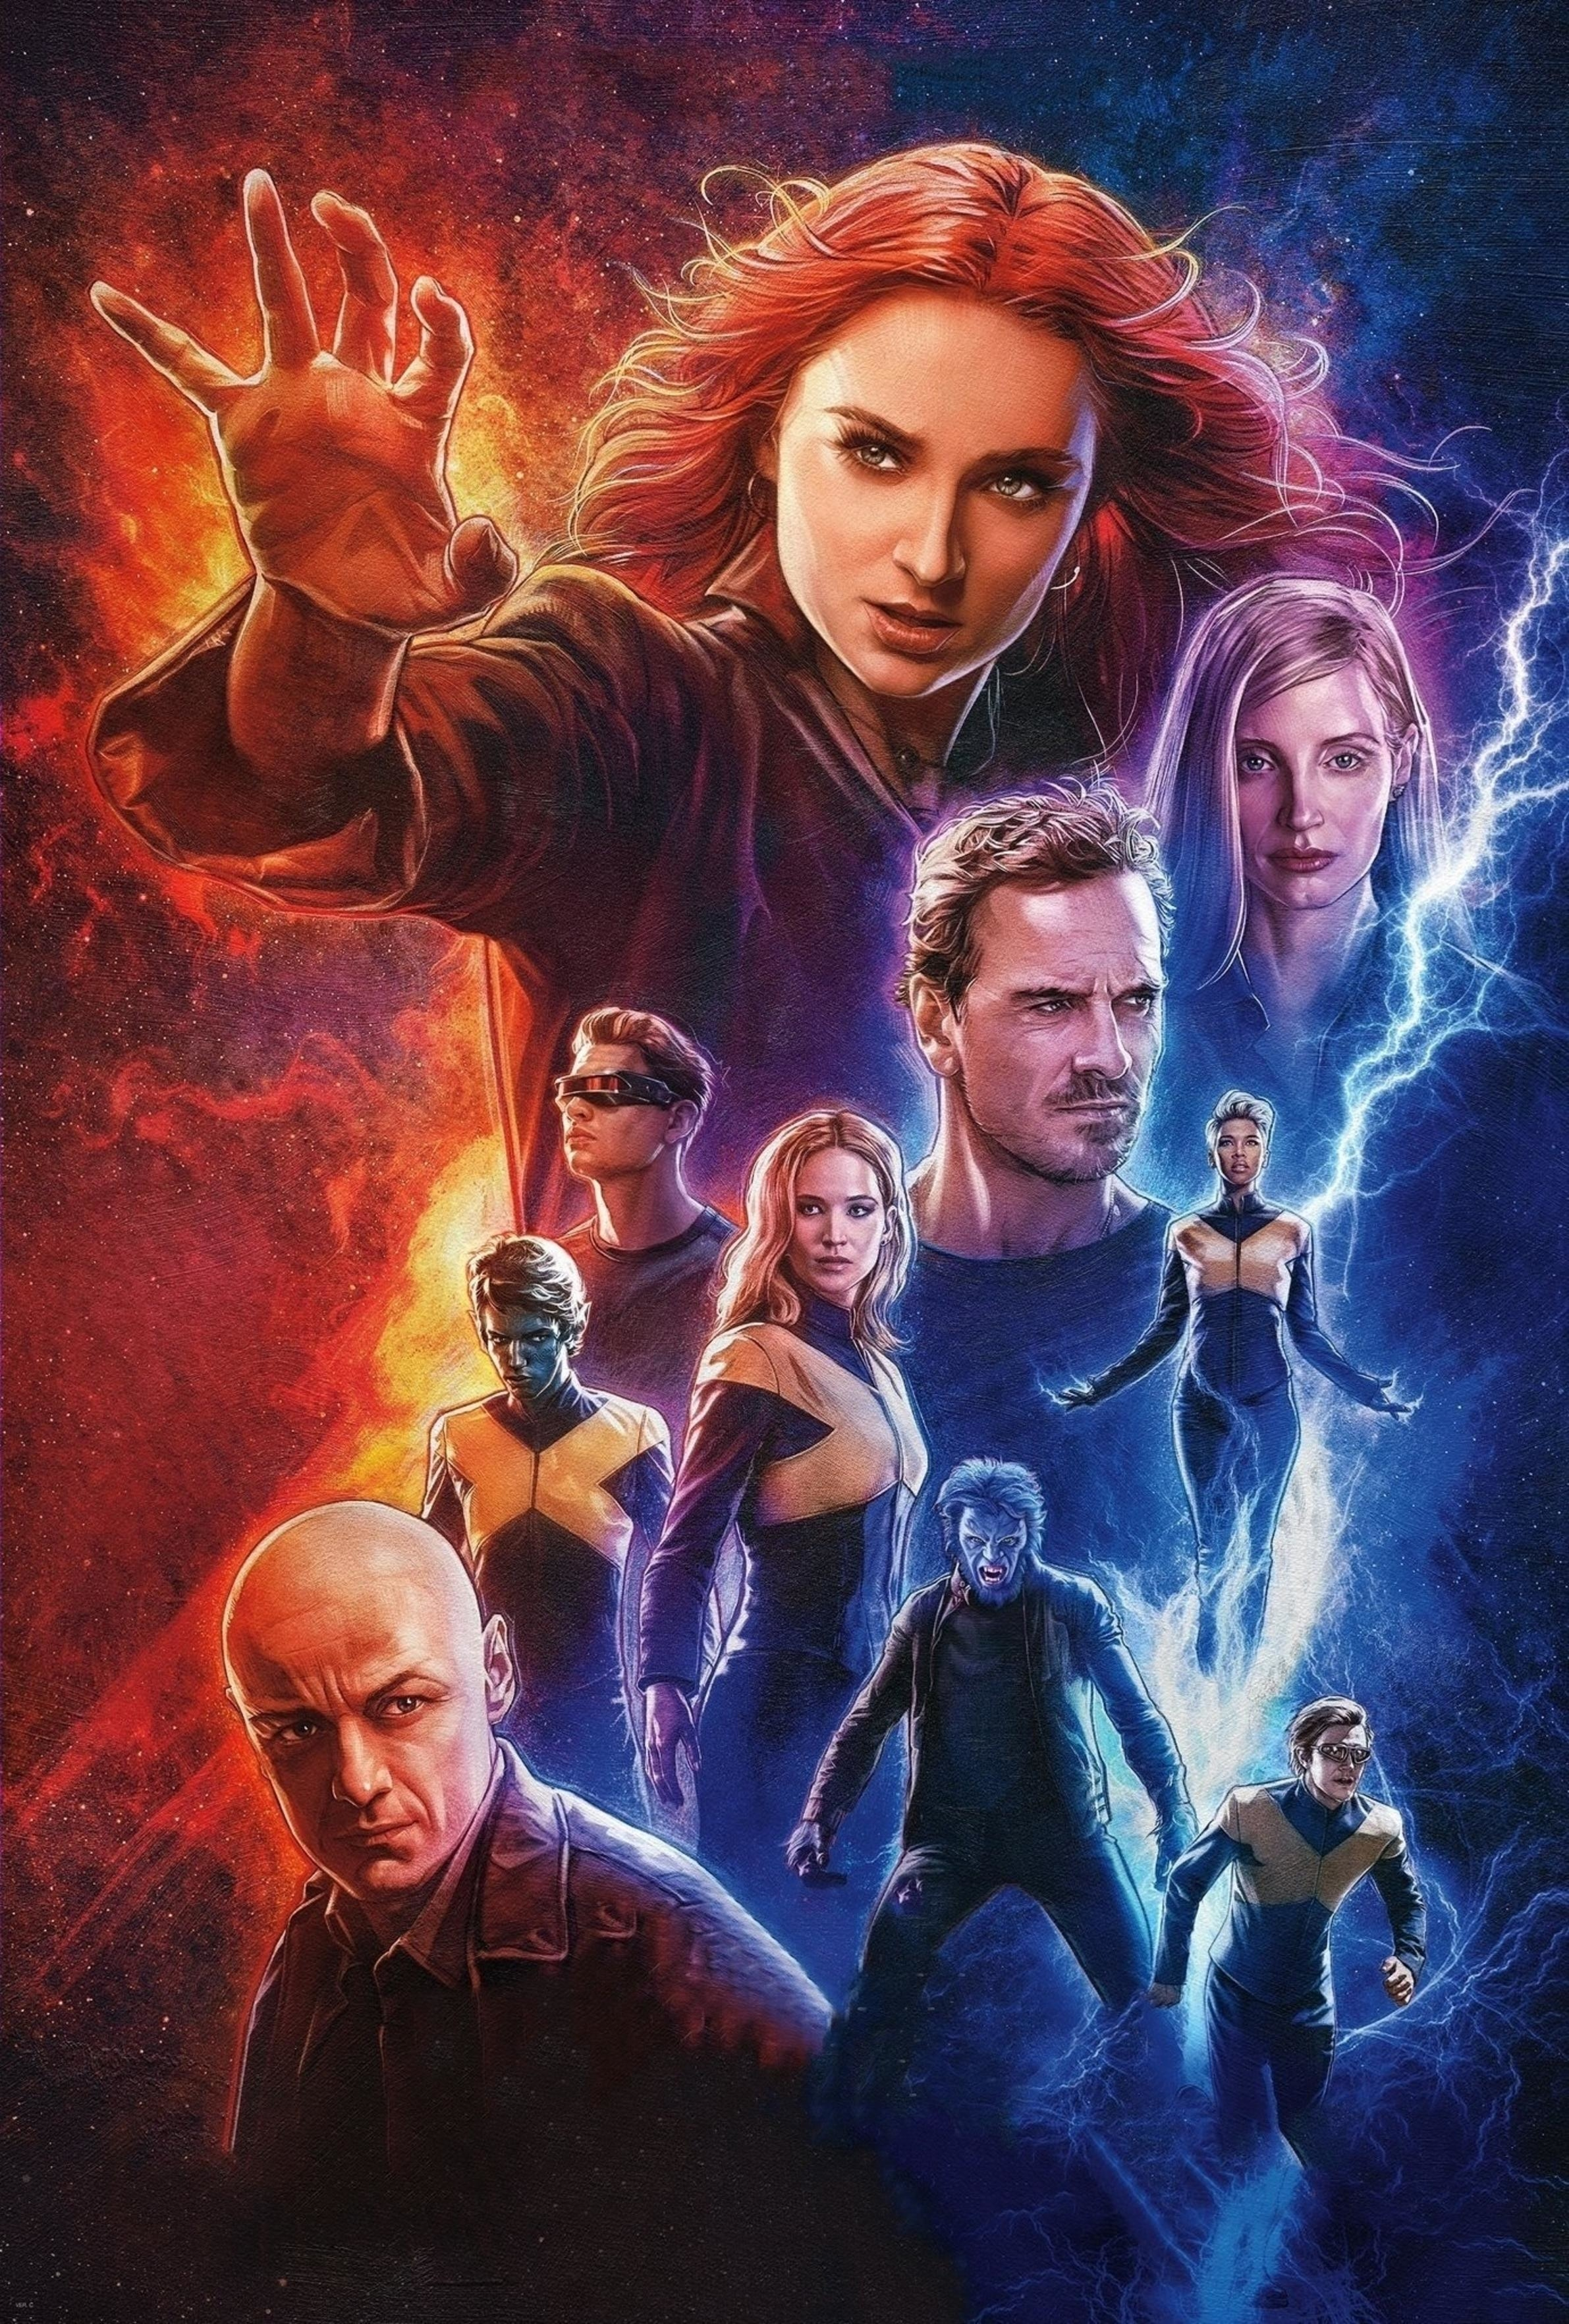 Dark Phoenix X Men Movie Poster Wallpaper HD Movies 4K Wallpapers 2382x3528